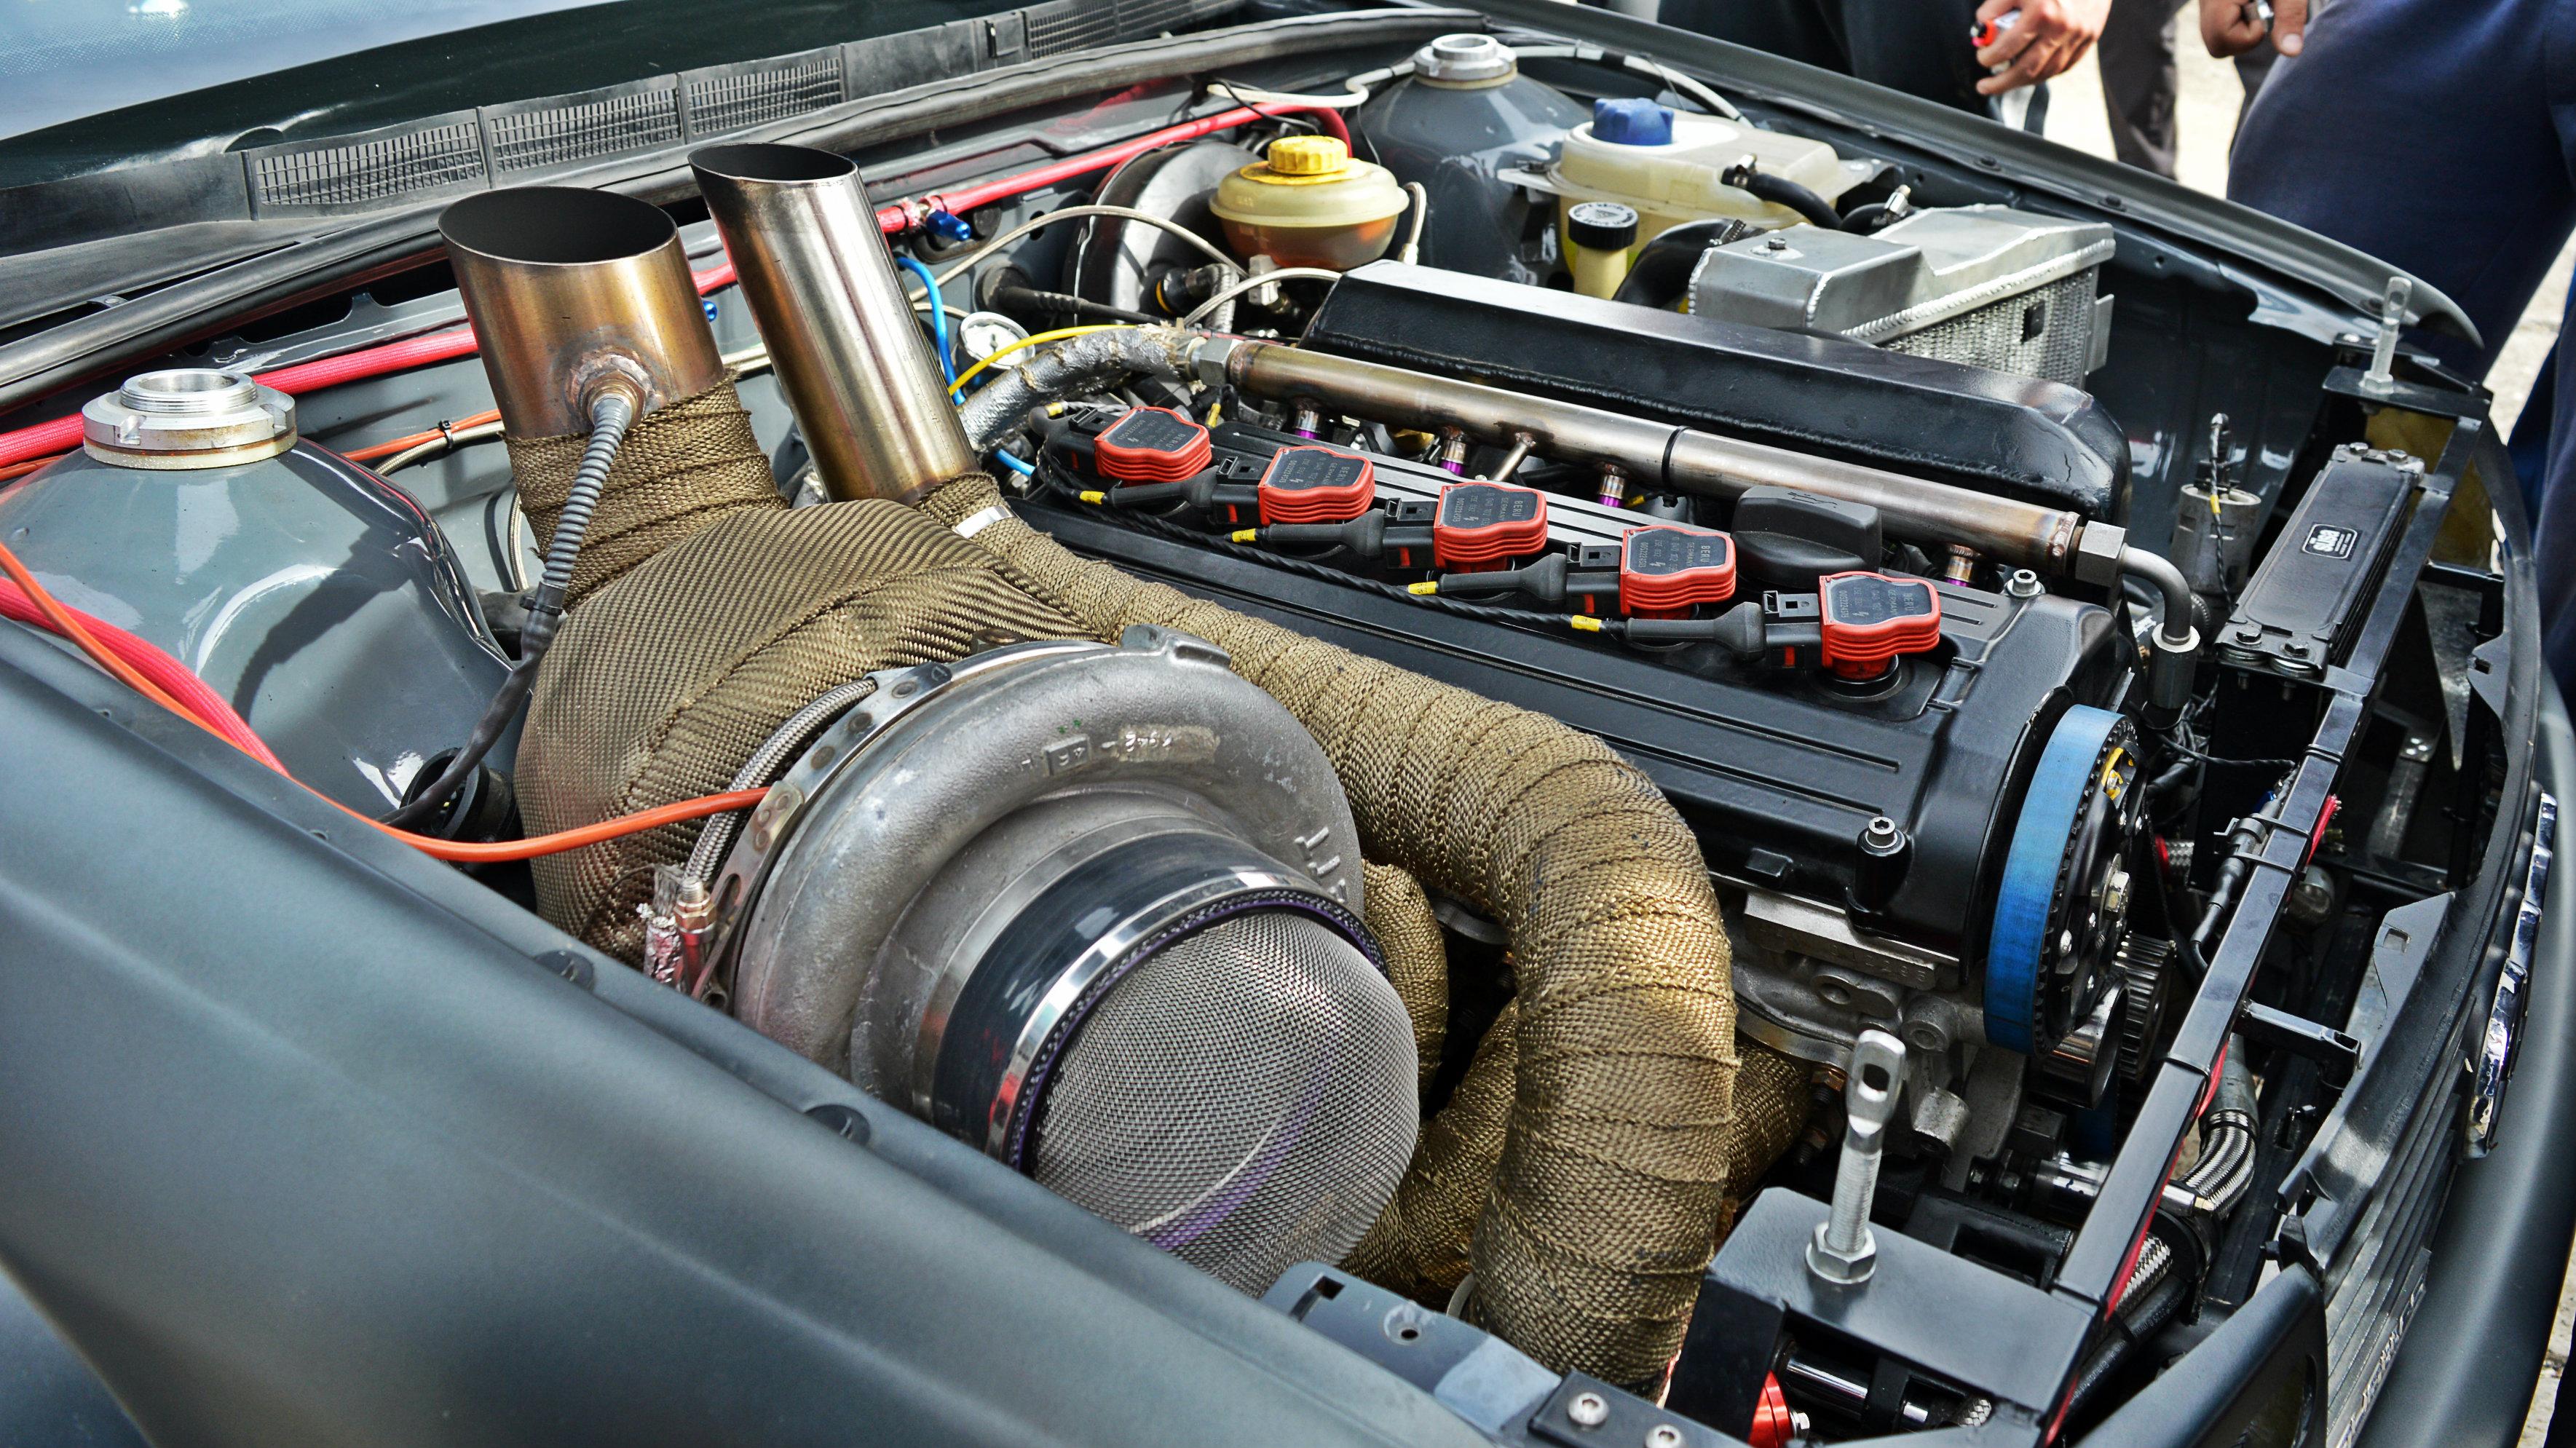 3538x1989 px Drag Racing Romania Động cơ Ianca Xe đua Romania Tuabin